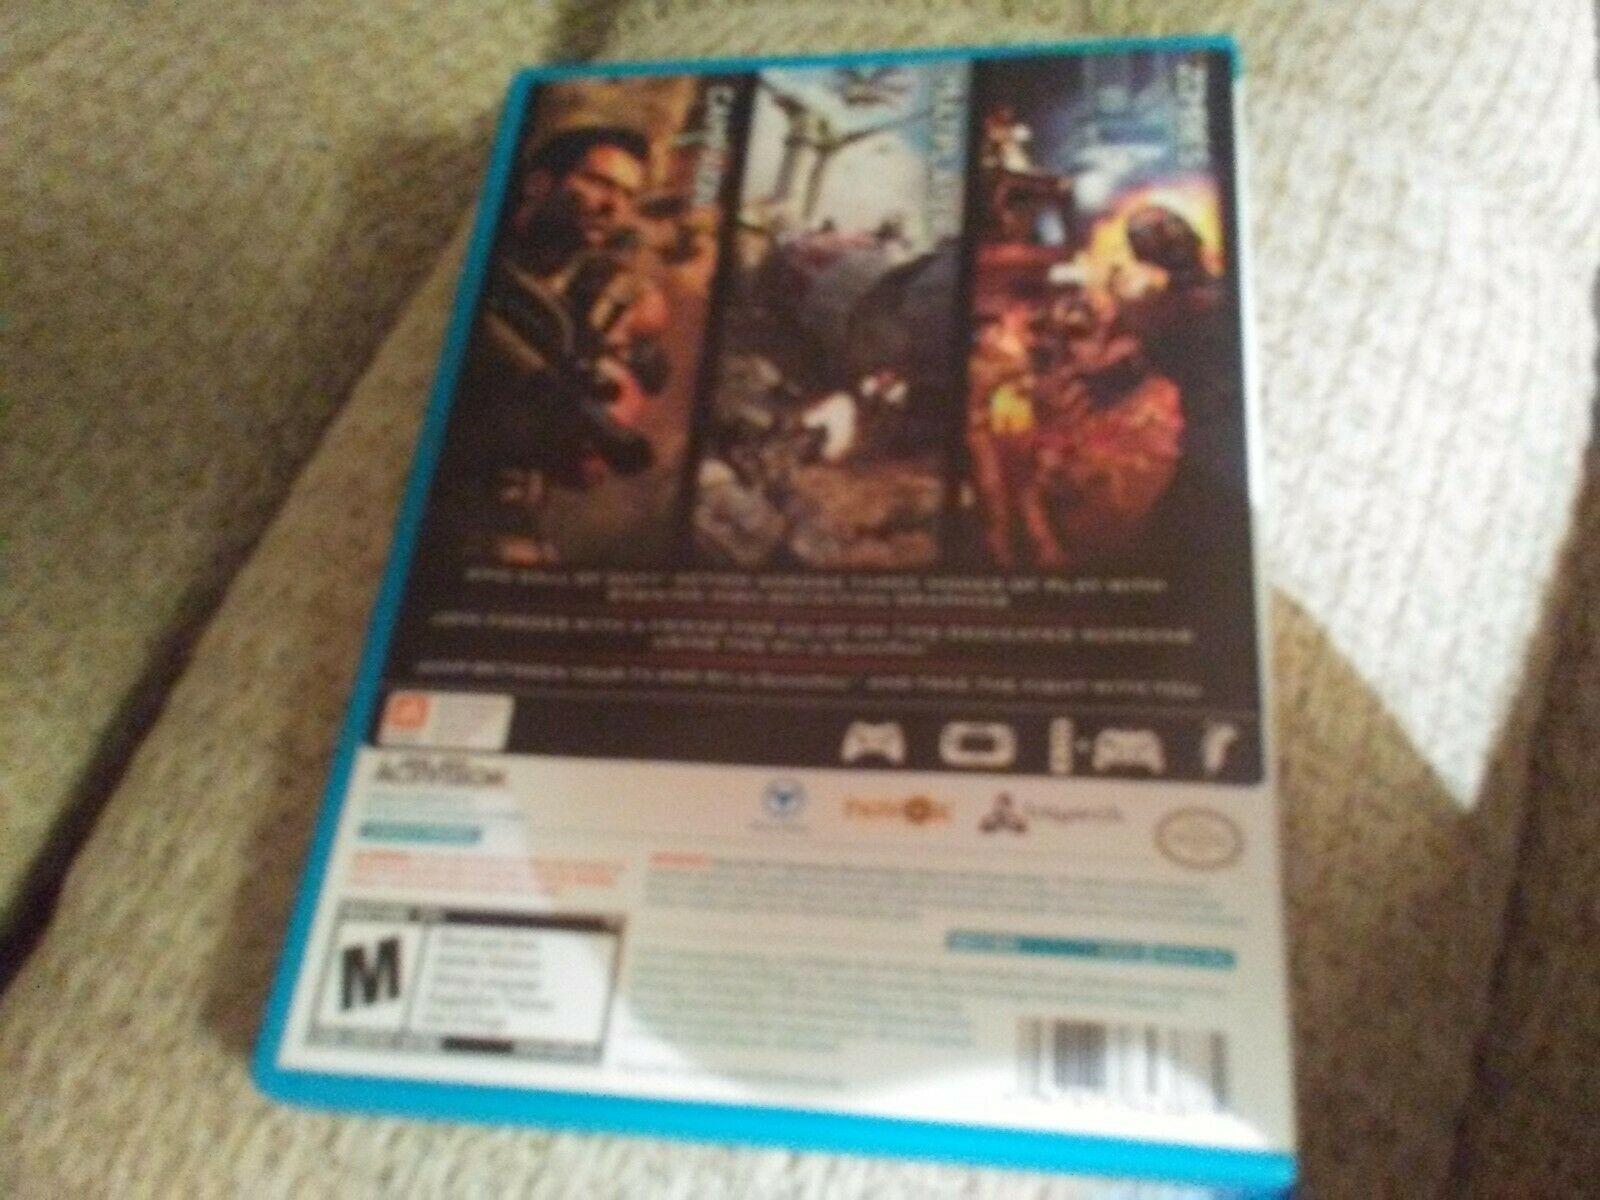 Call of Duty: Black Ops II (Nintendo Wii U, 2012) image 2